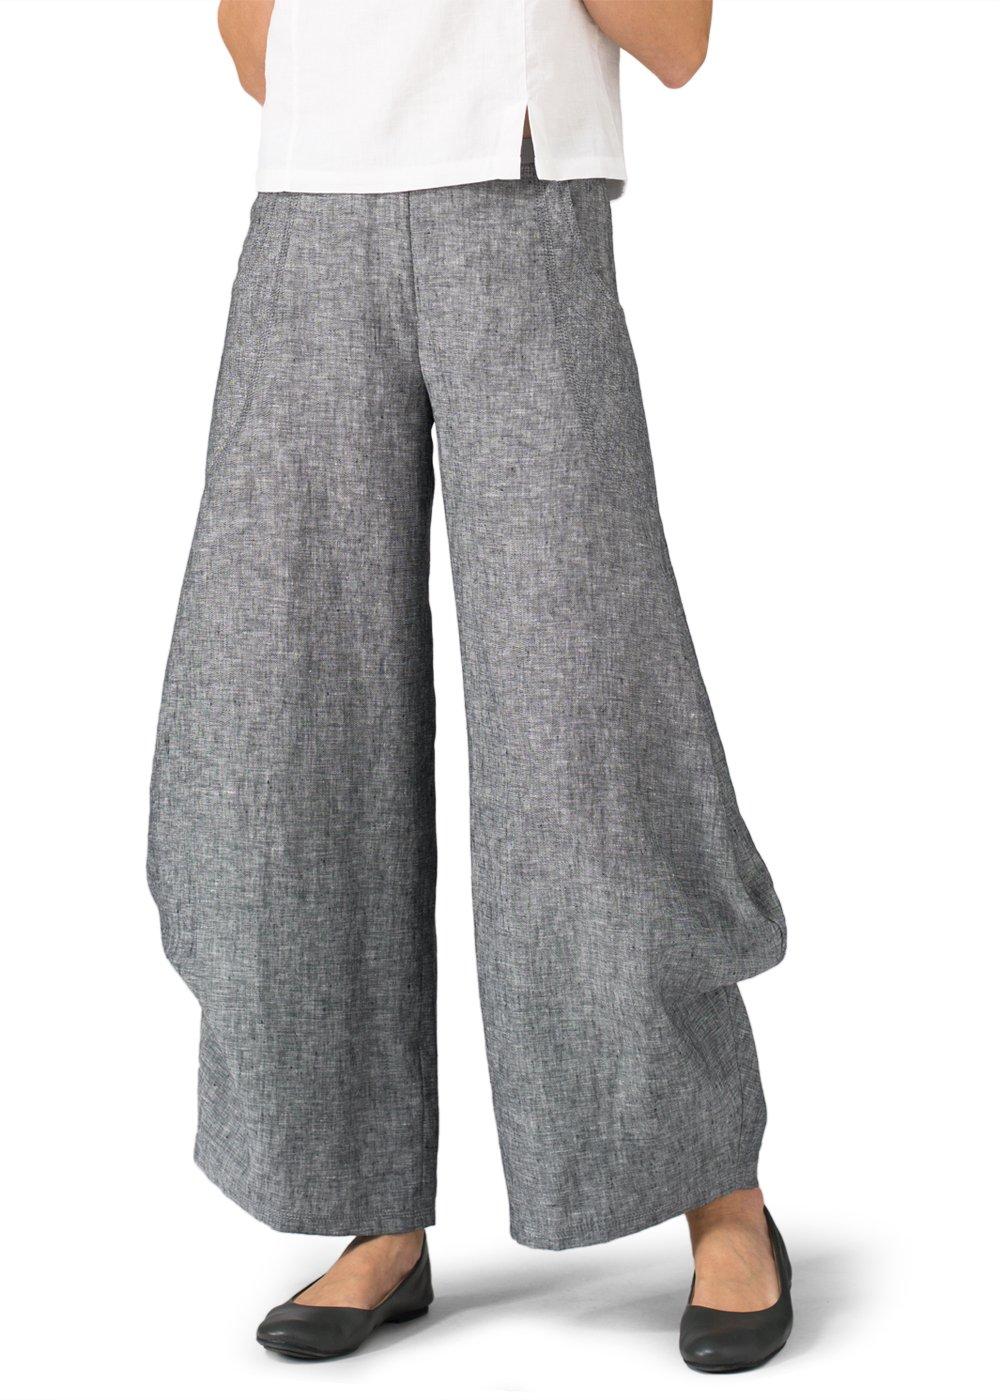 Vivid Linen Flared Leg Pants-26W-Two Tone Black